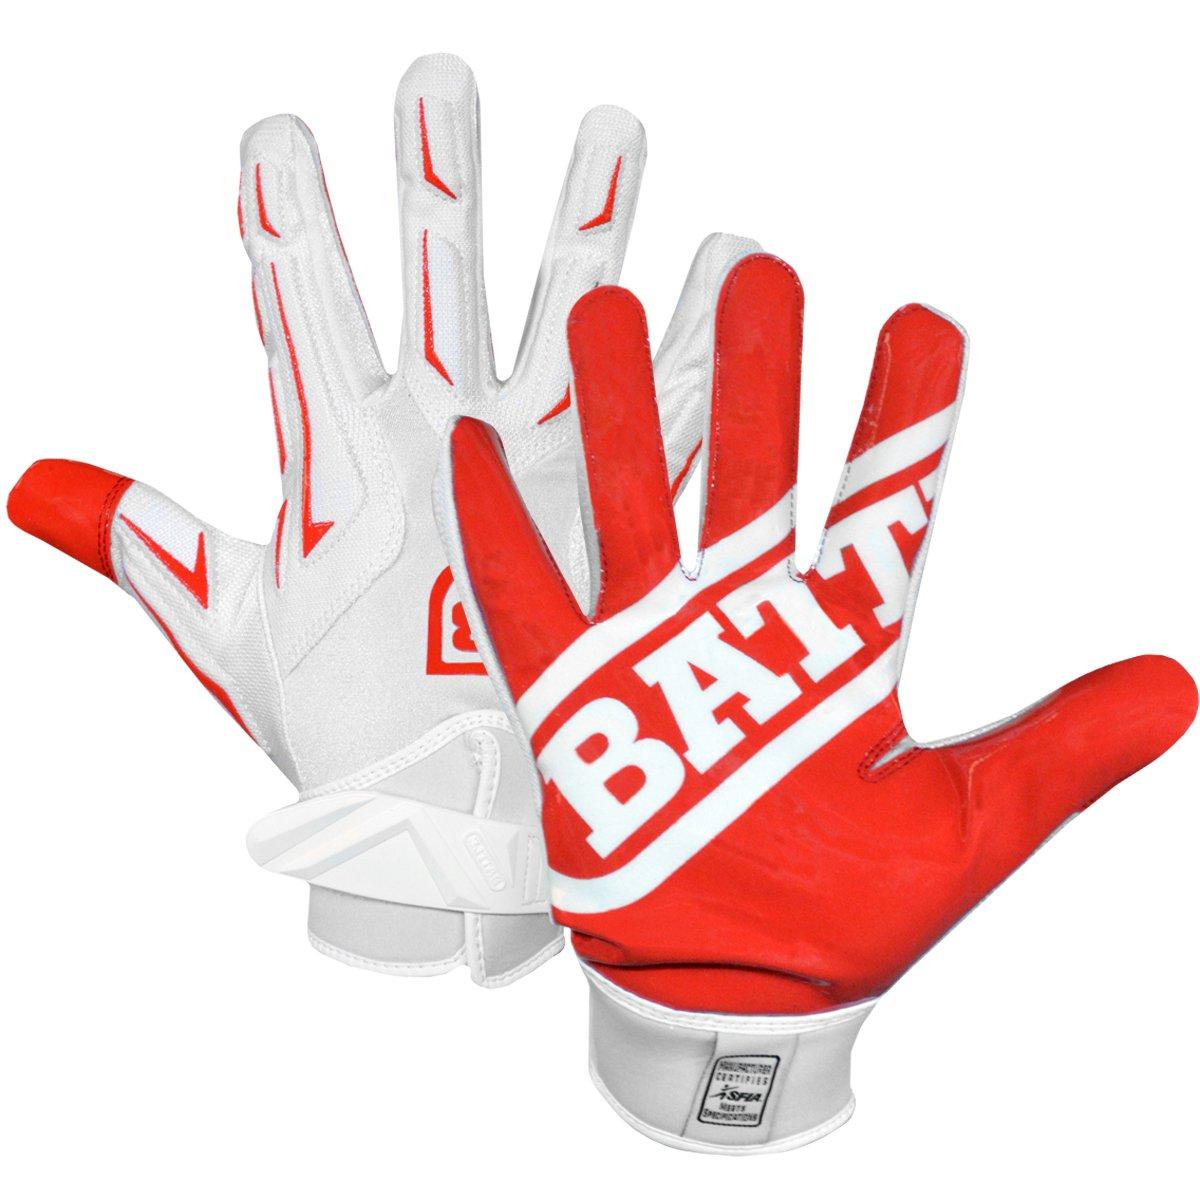 Battle Sports Hybrid Gloves - Red / White - Youth - XL